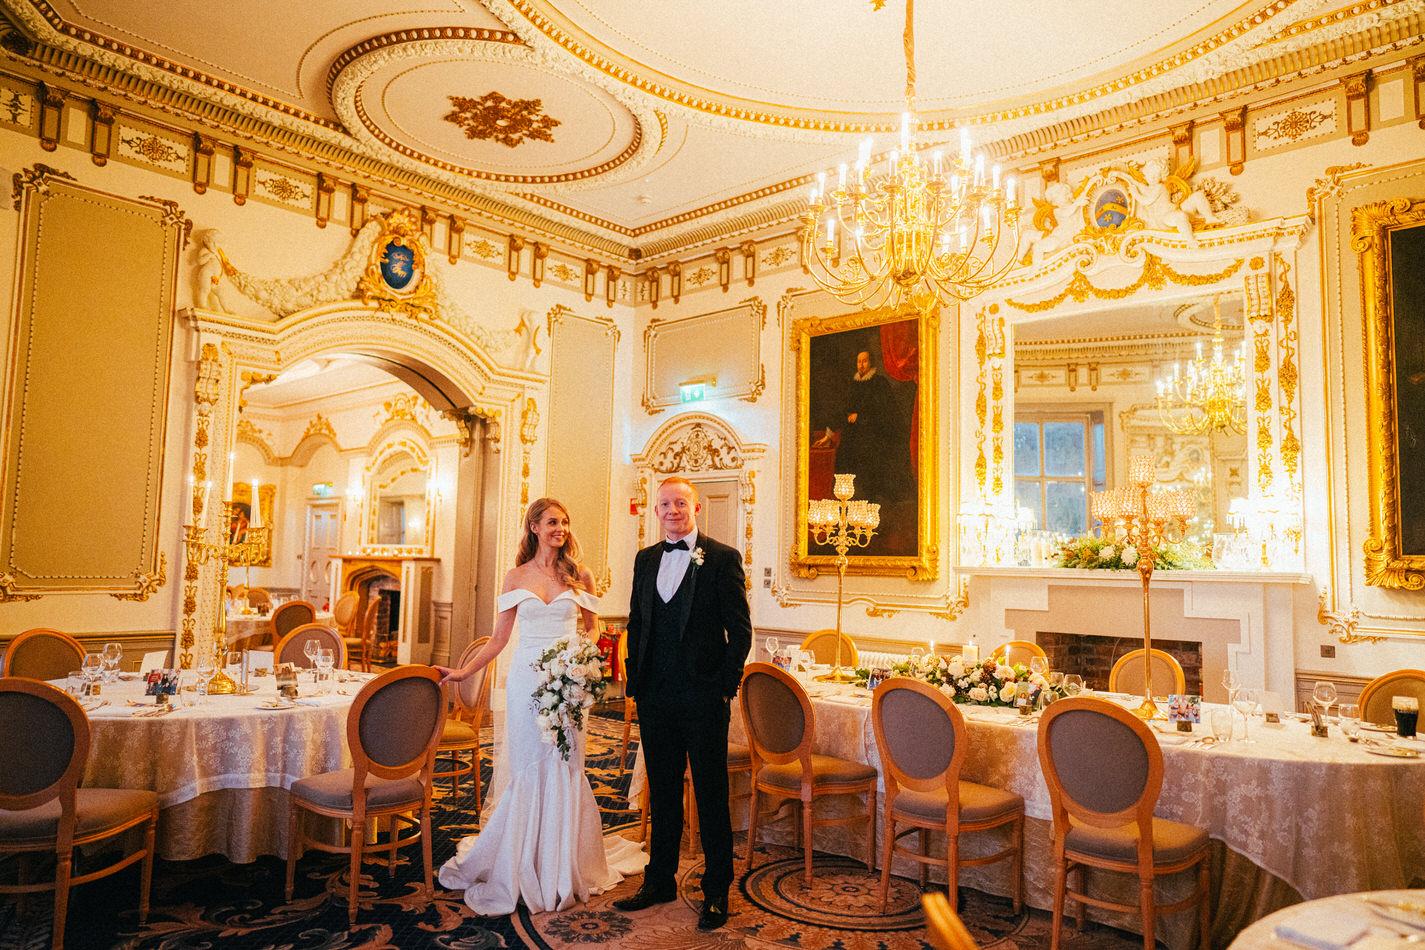 Castle-wedding-ireland-photos- 0254 192